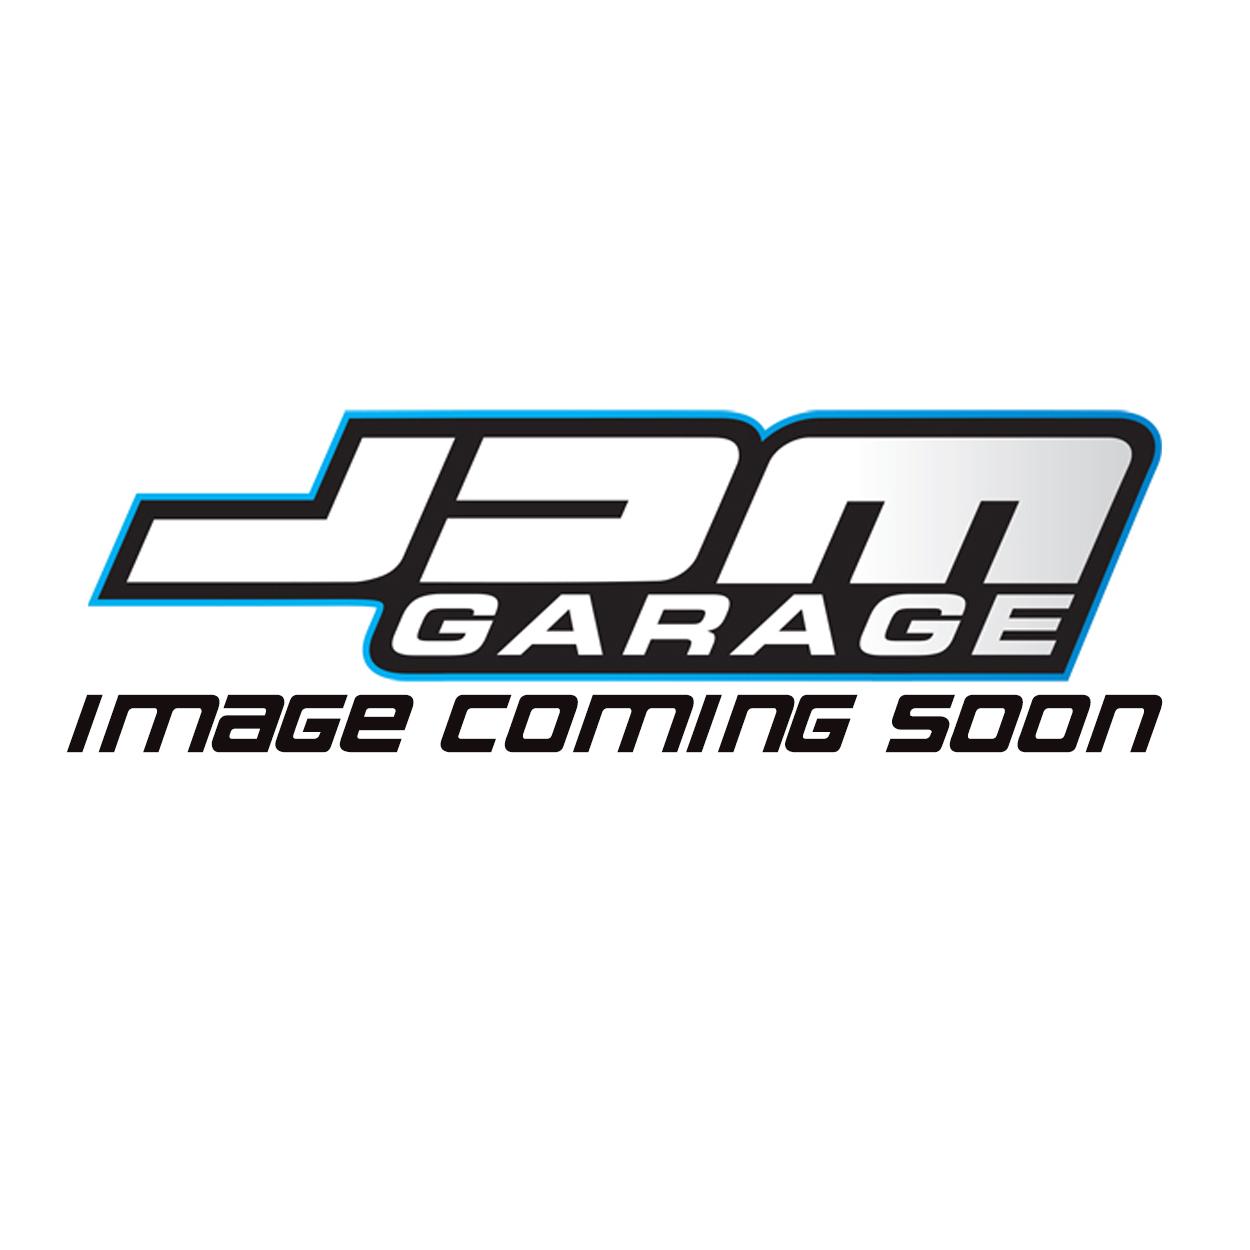 OE Nissan SR20DET Timing Chain Kit - Late Model, VVT, Bent Cam, Black Top